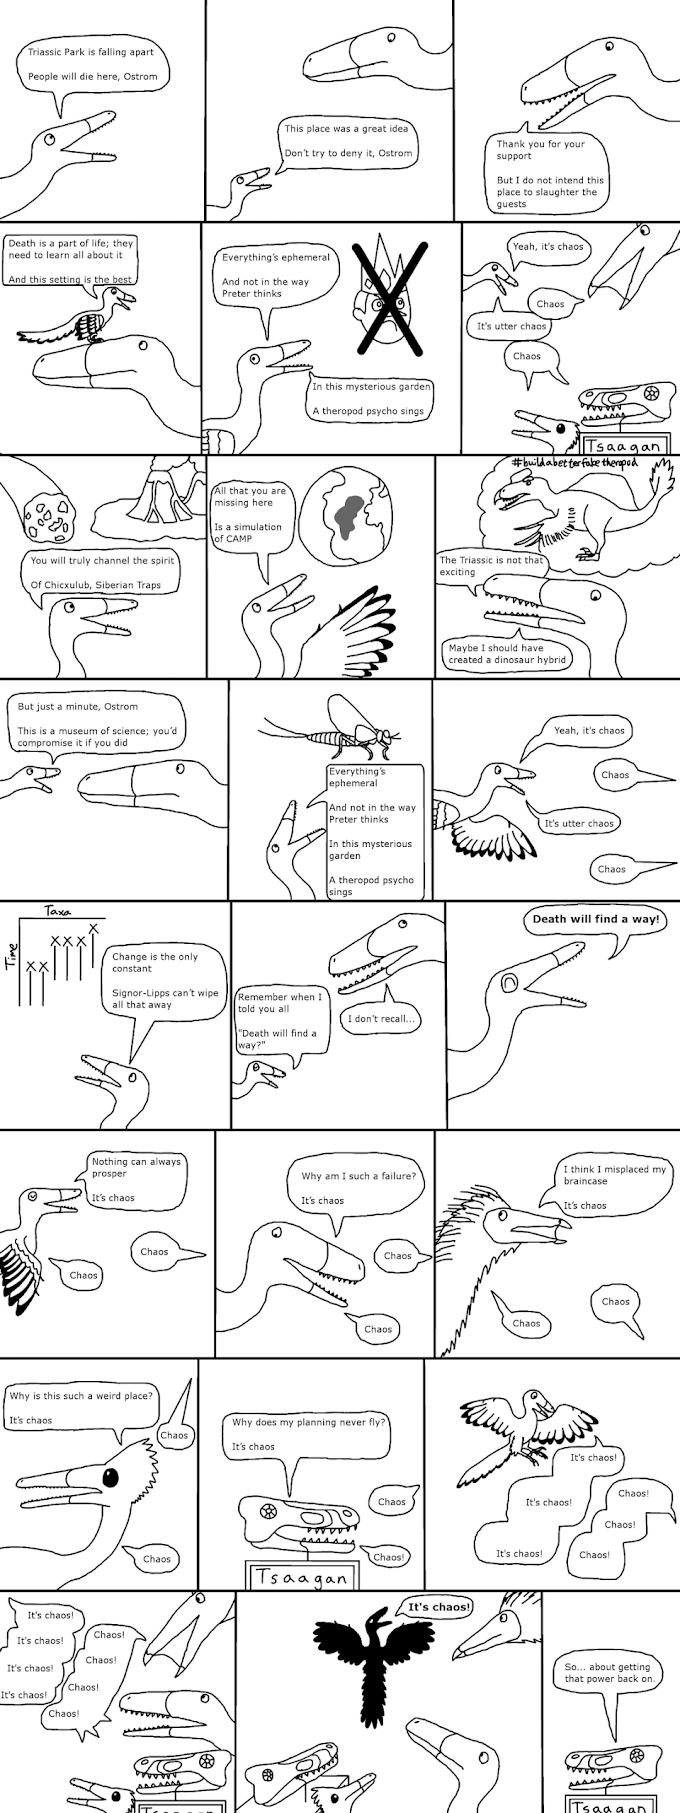 Triassic Park Page IX